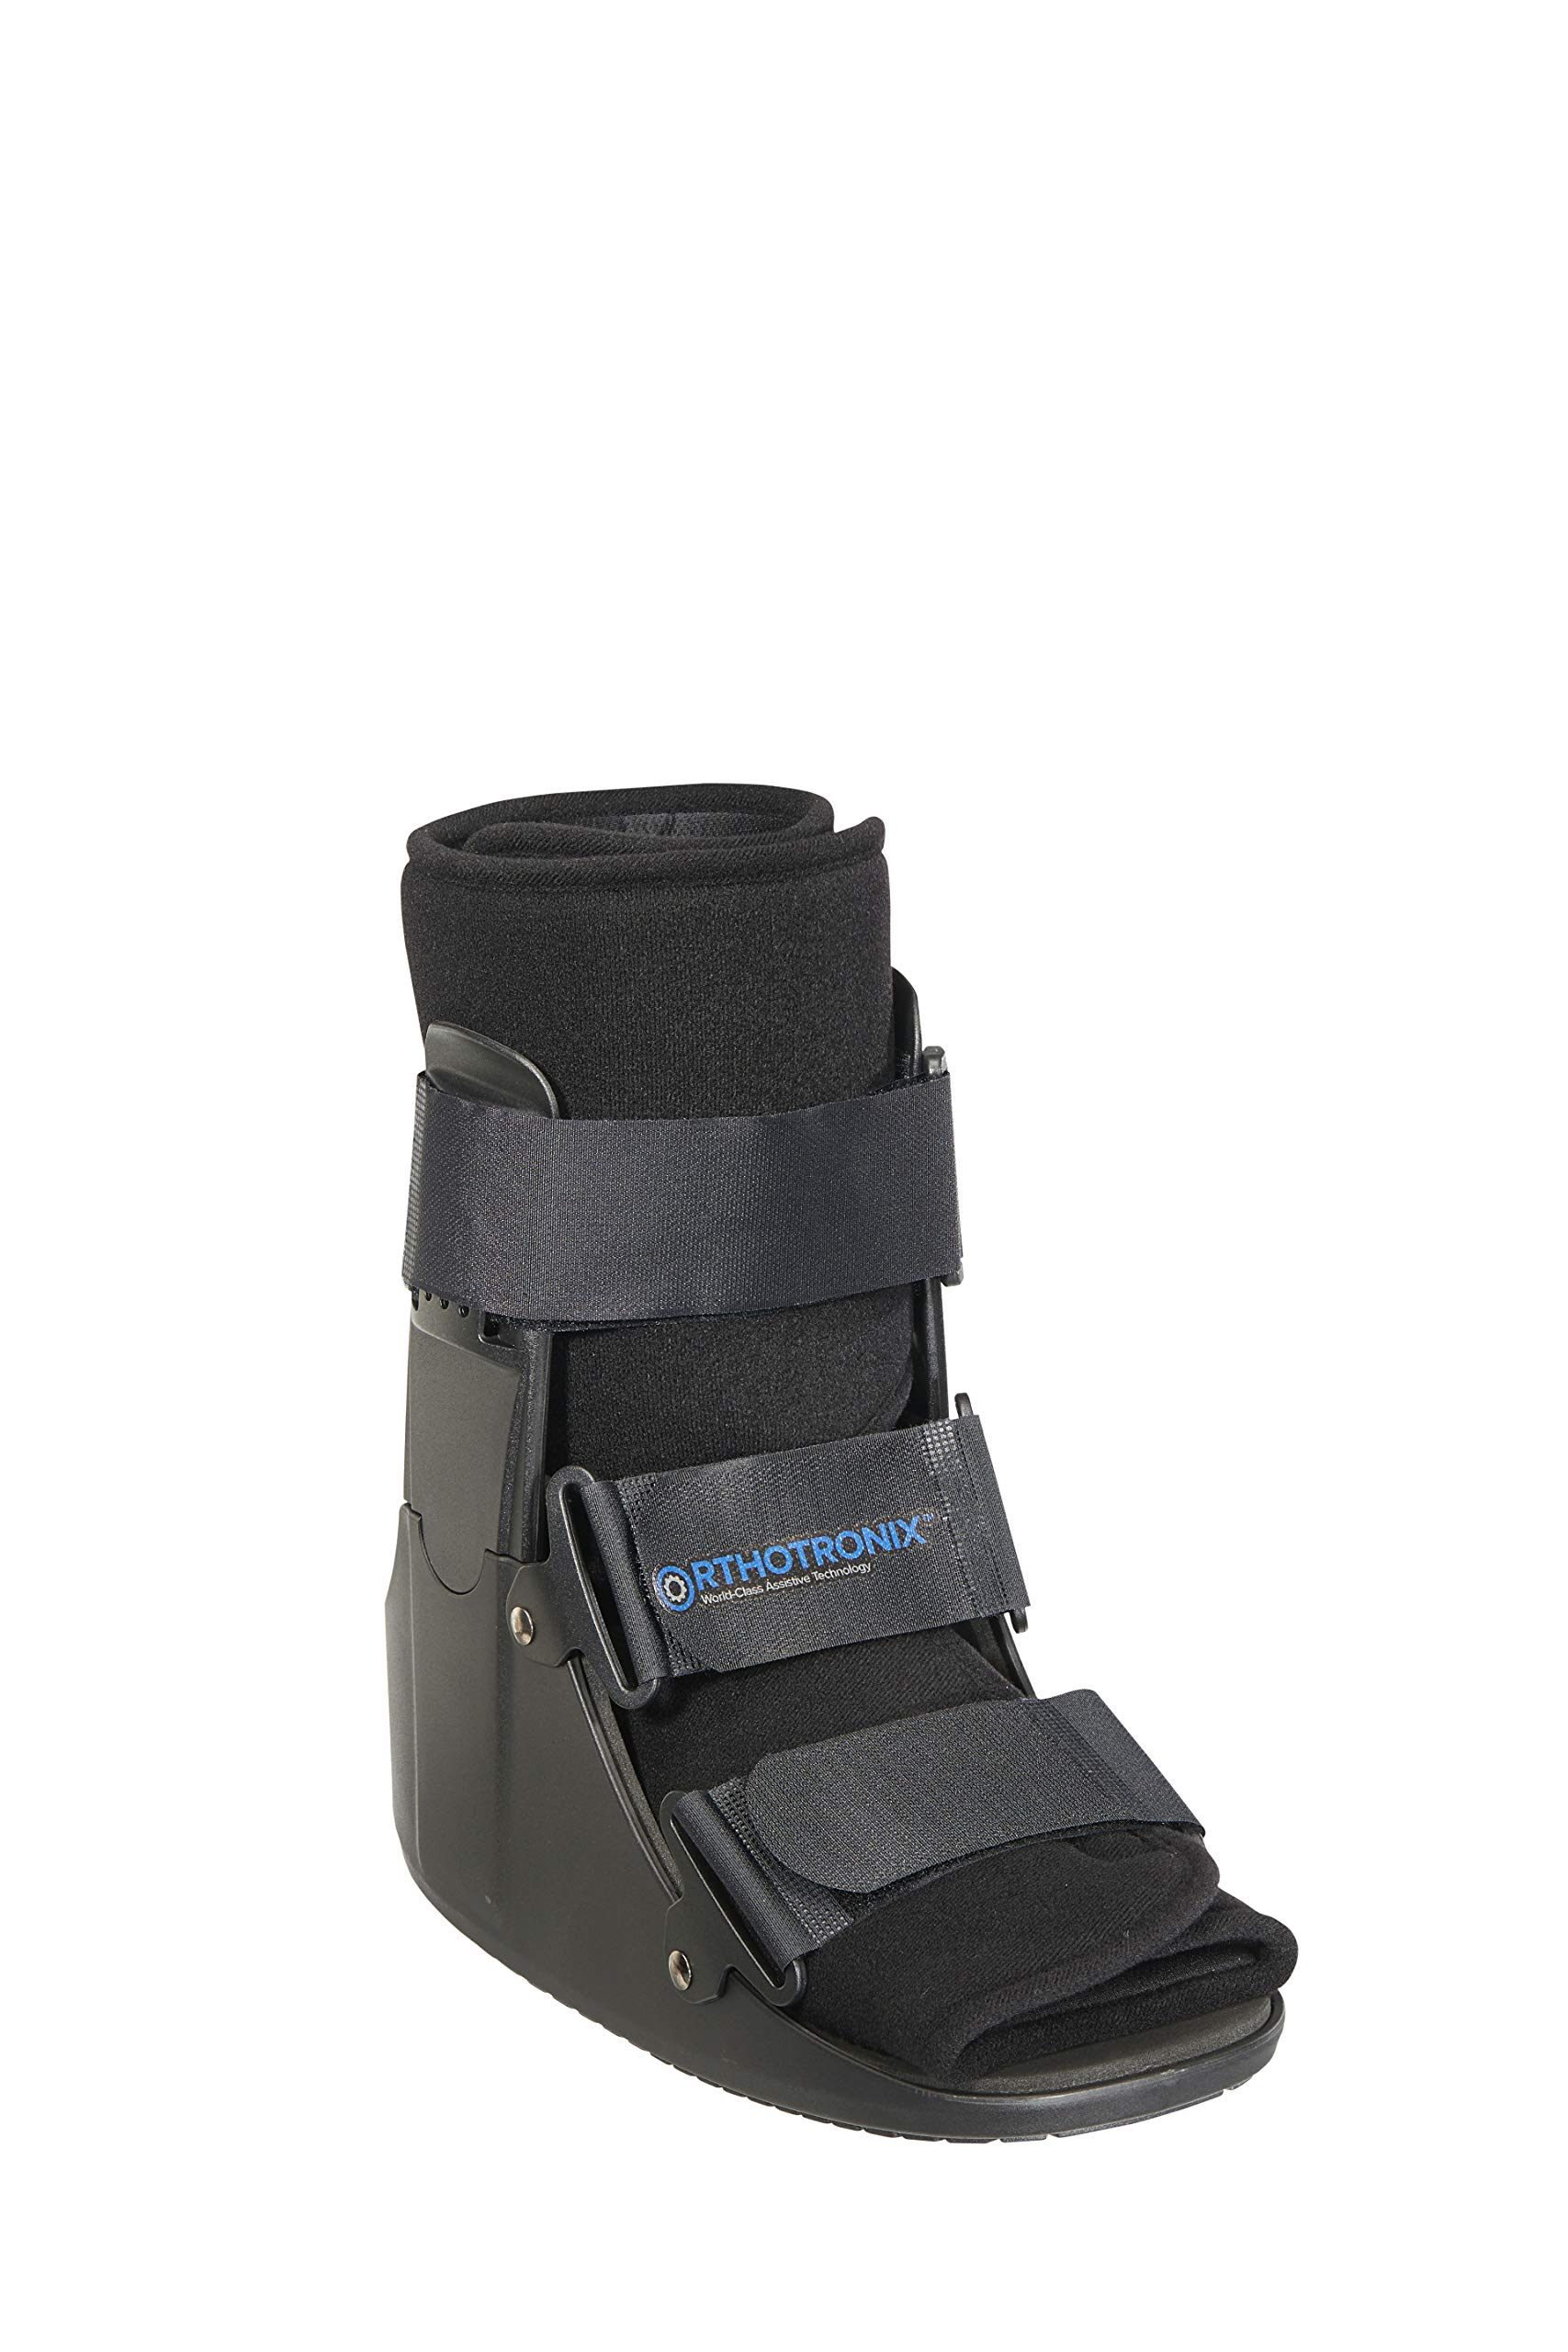 Orthotronix Short Cam Walker Boot (Small)